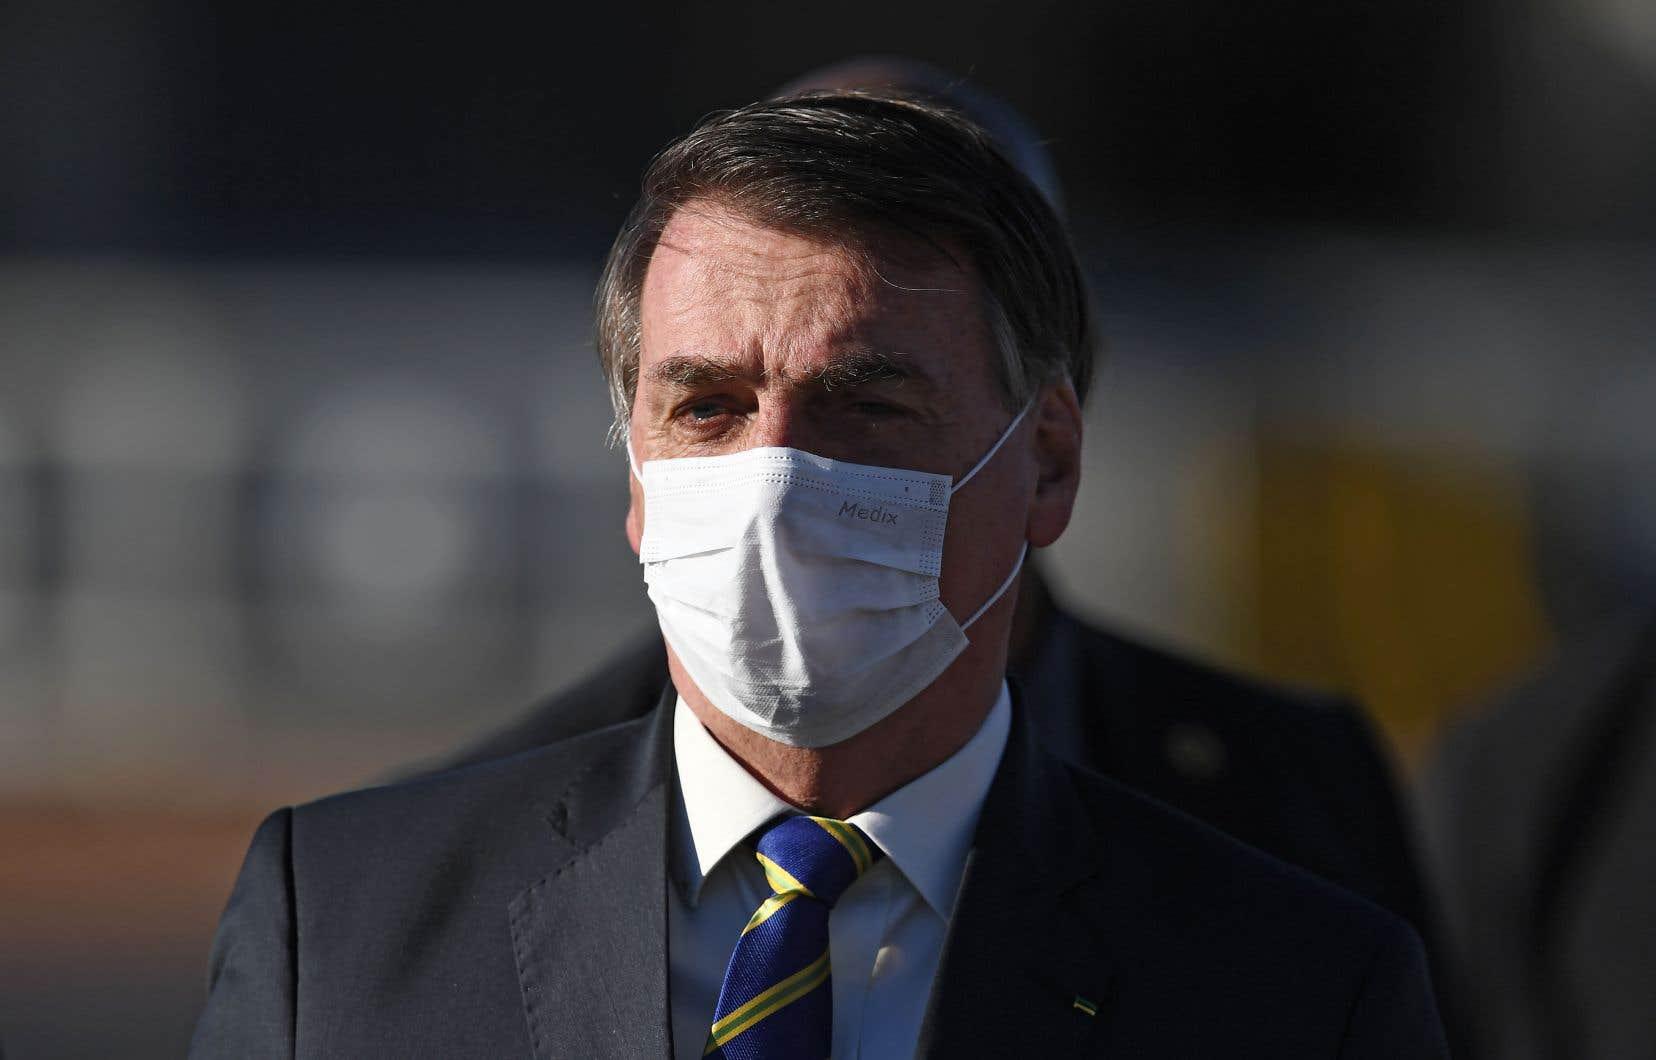 Le président d'extrême droite du BrésilJair Bolsonaro